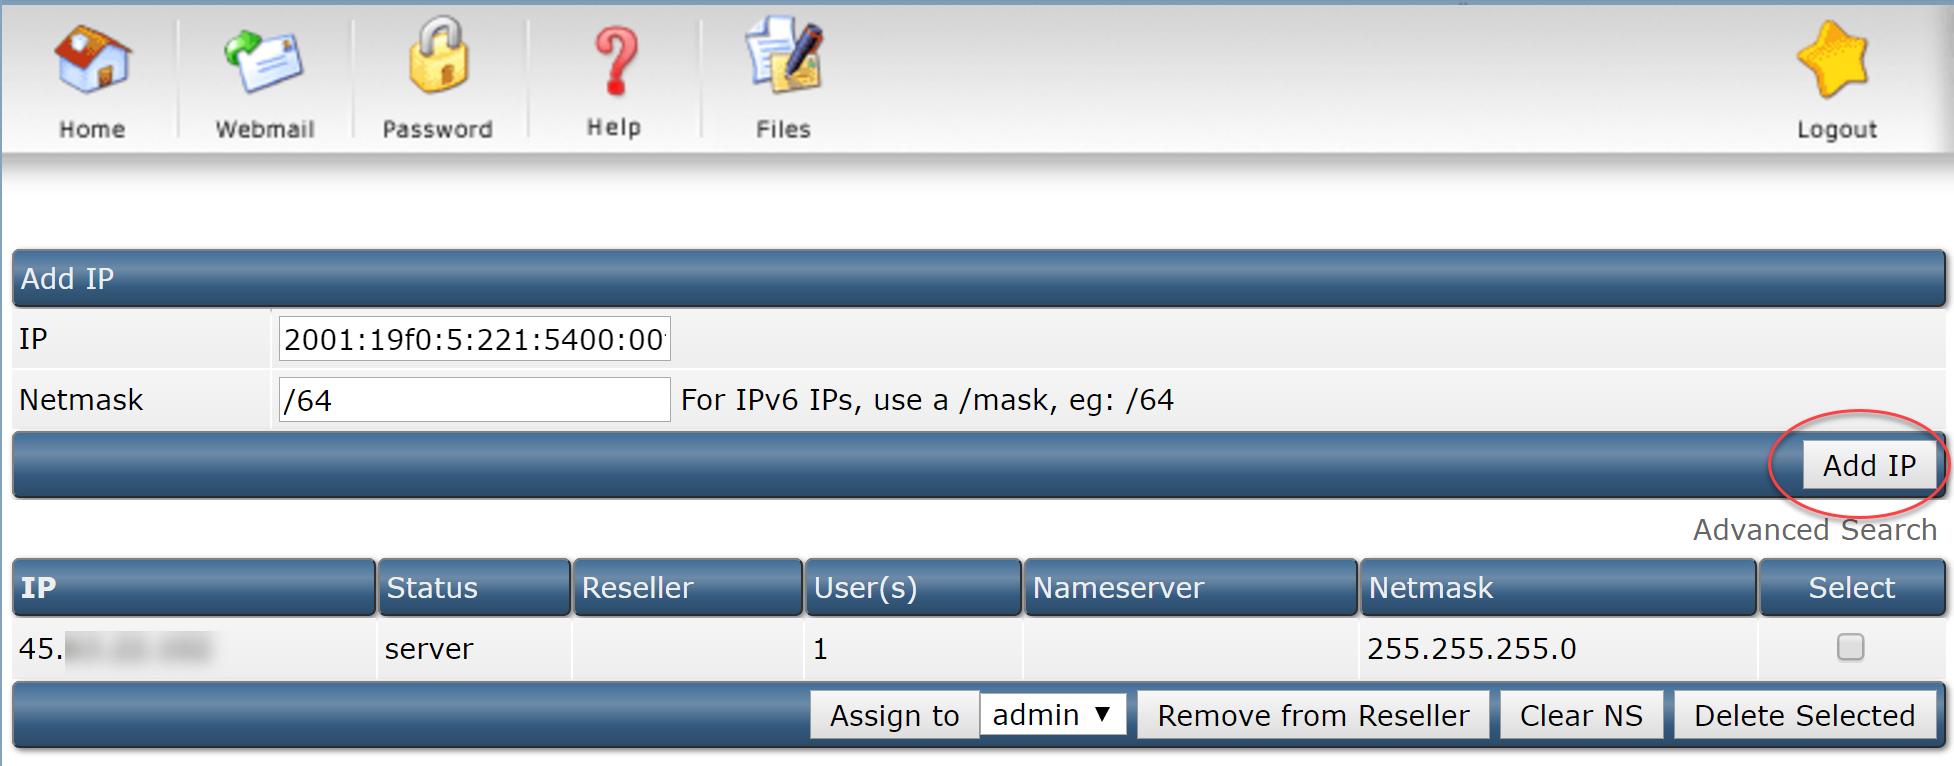 Adding IP